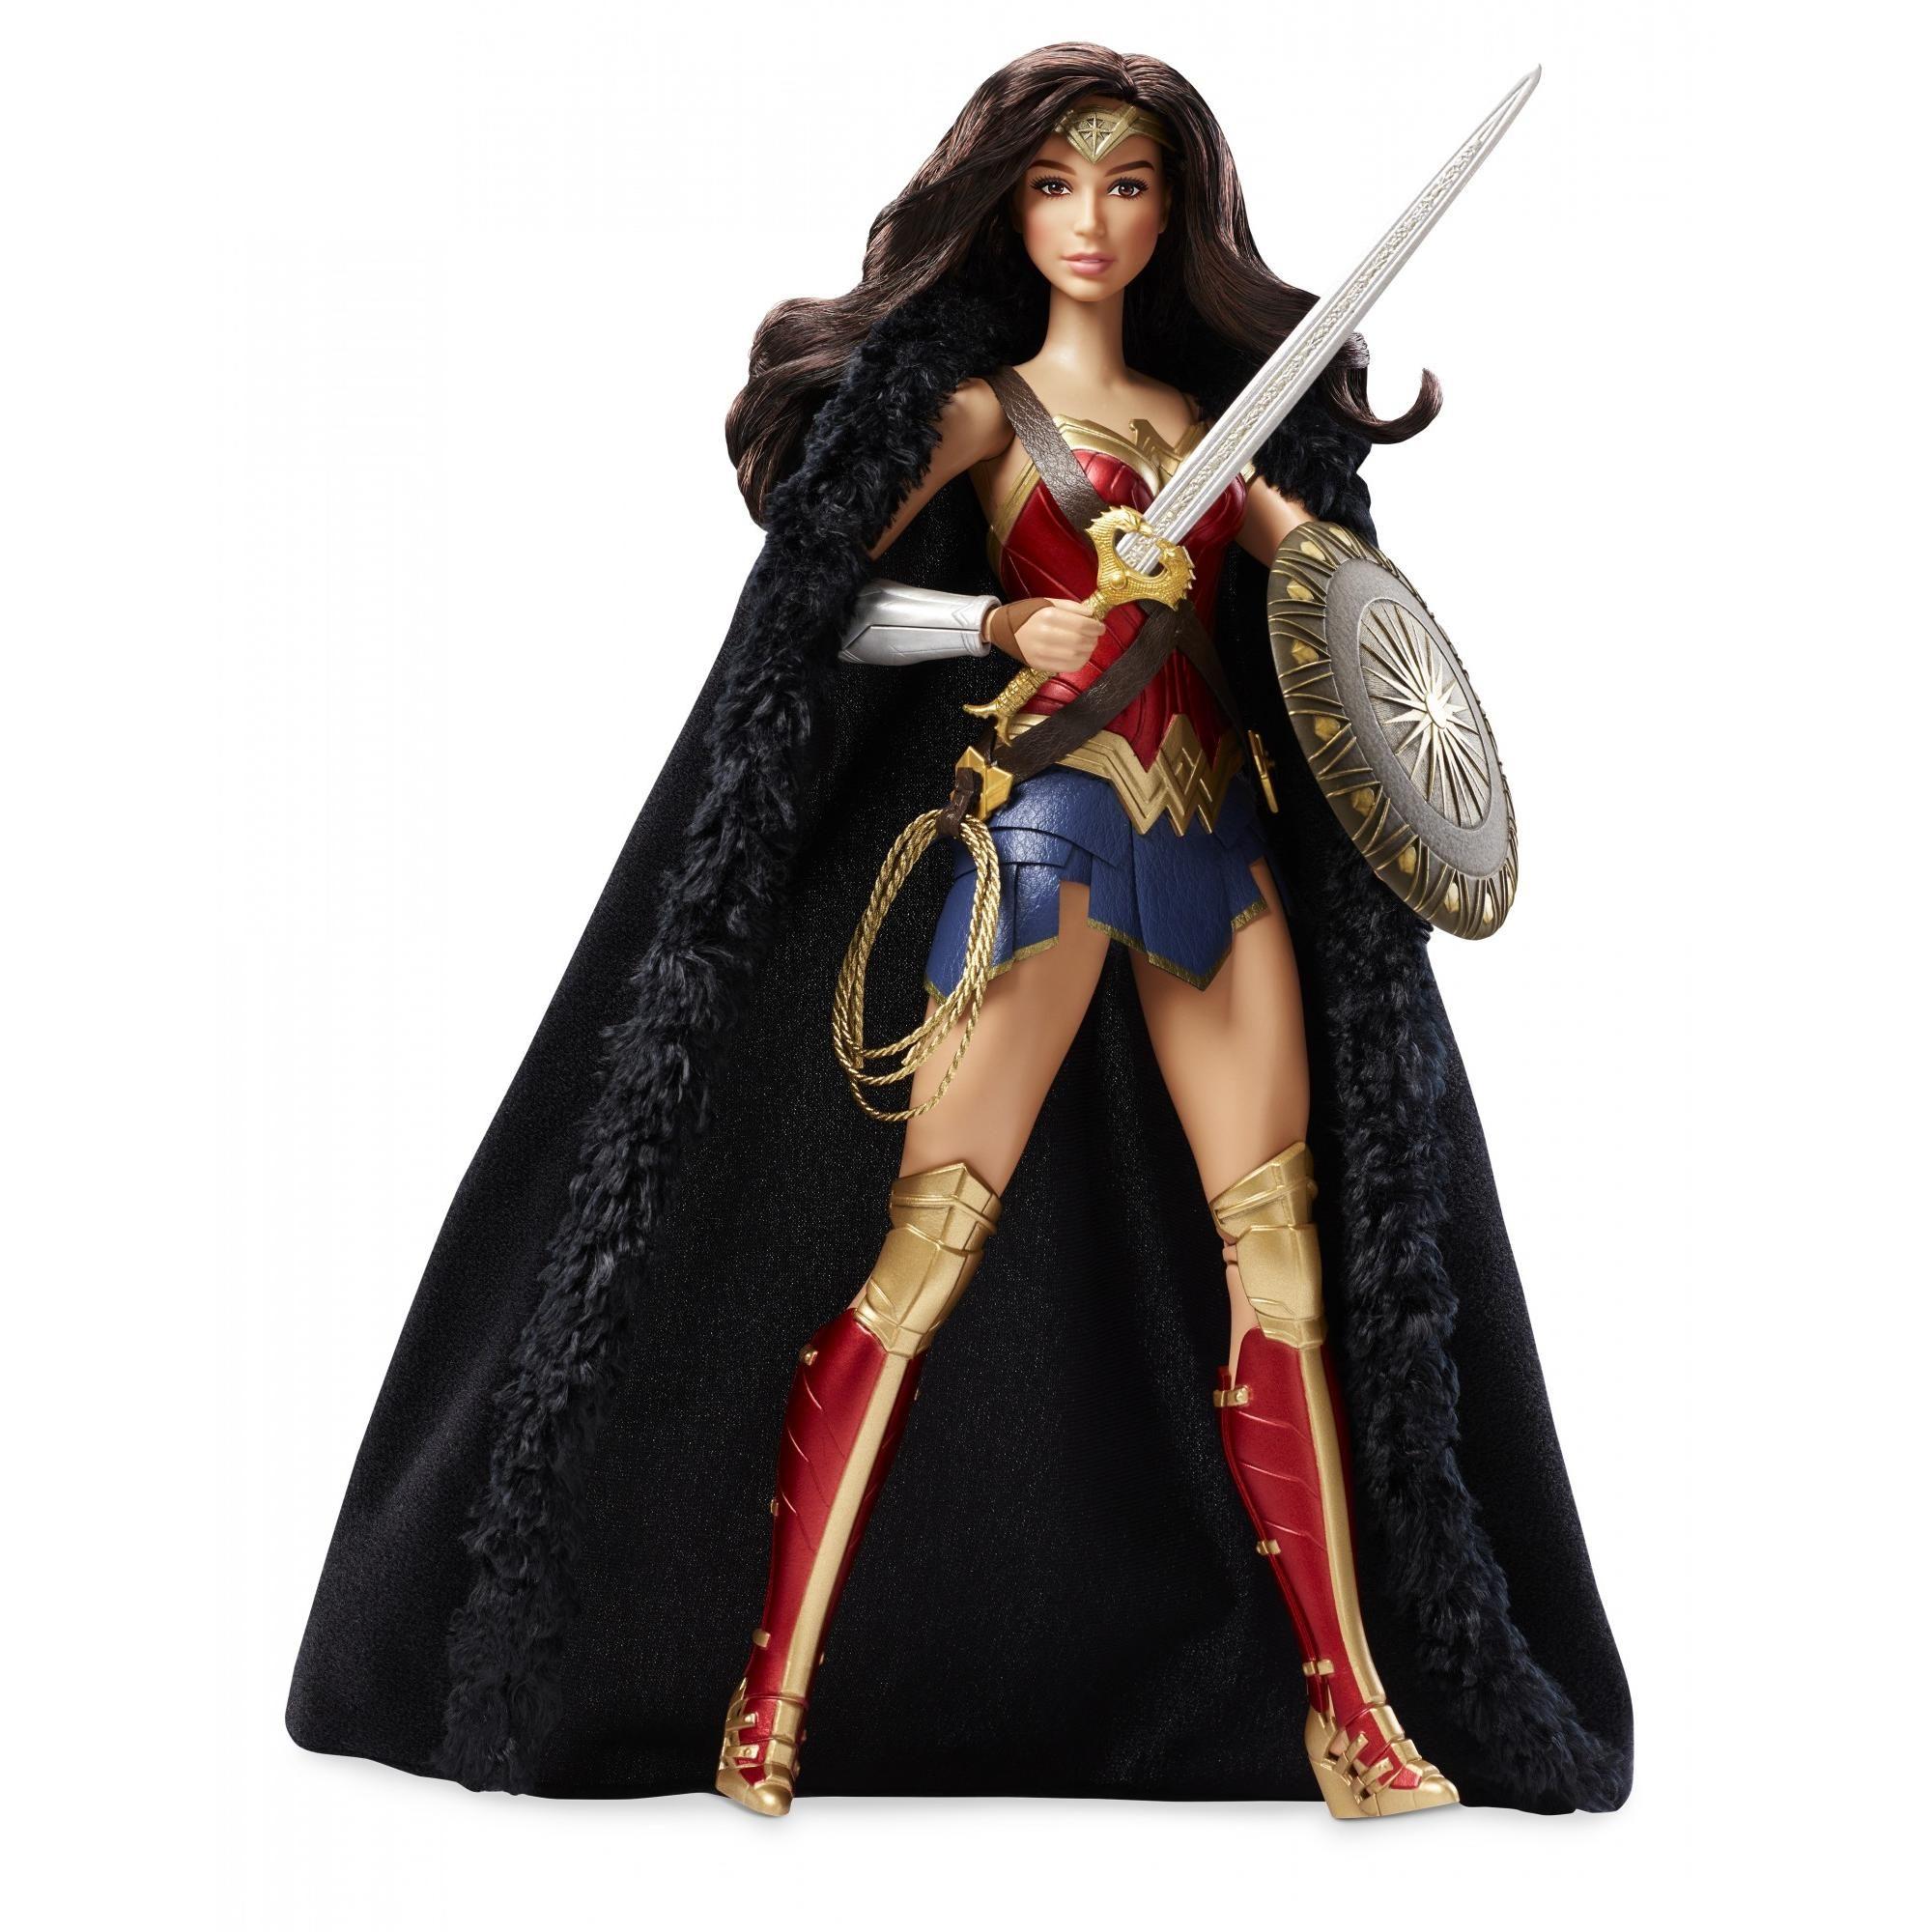 Barbie Wonder Woman Antiope Doll Kid Toy Game Girl Princess Super Hero Comics